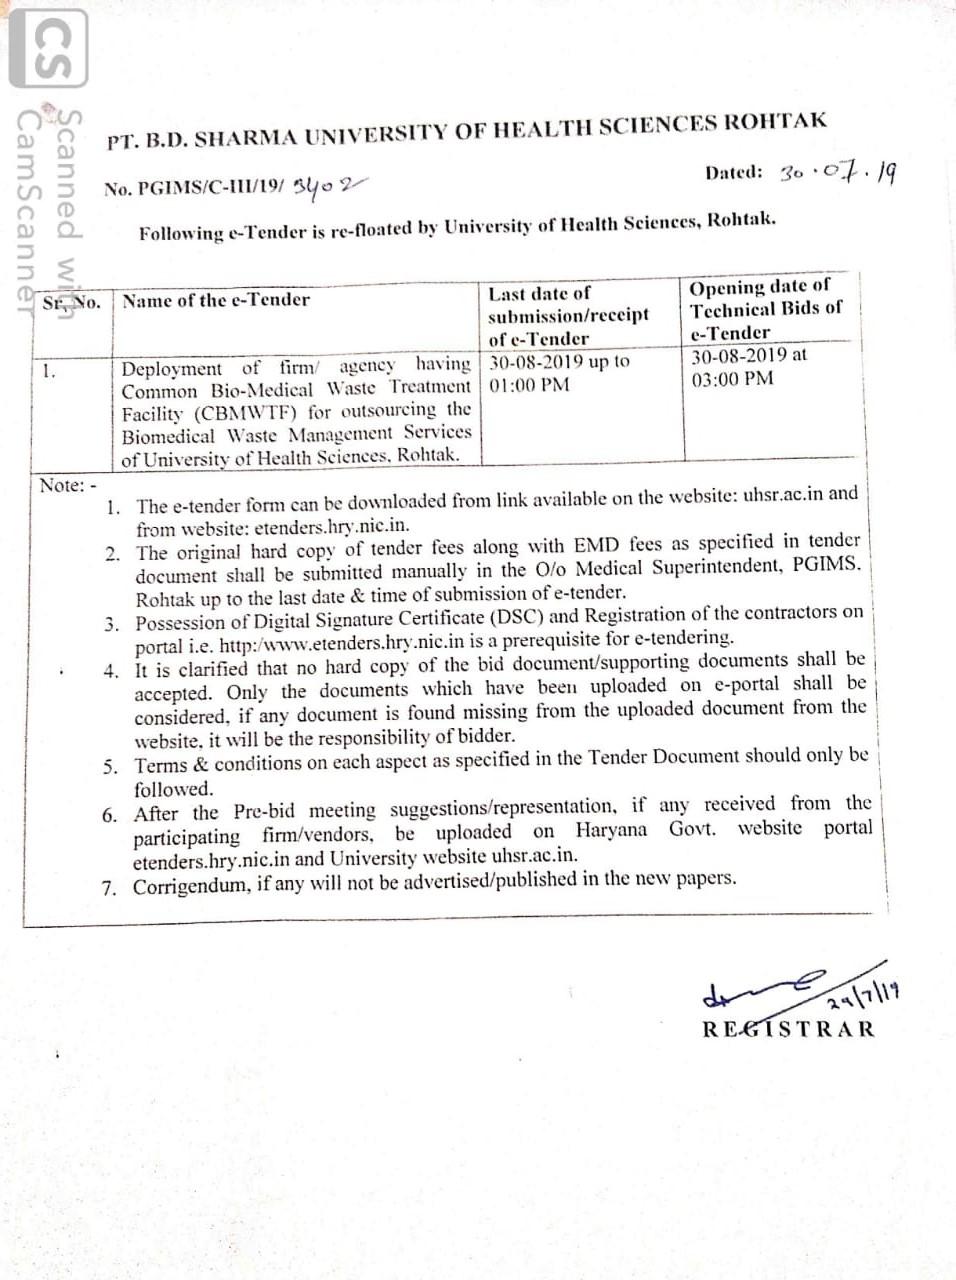 UHSR: Pt  Bhagwat Dayal Sharma University of Health Sciences, Rohtak